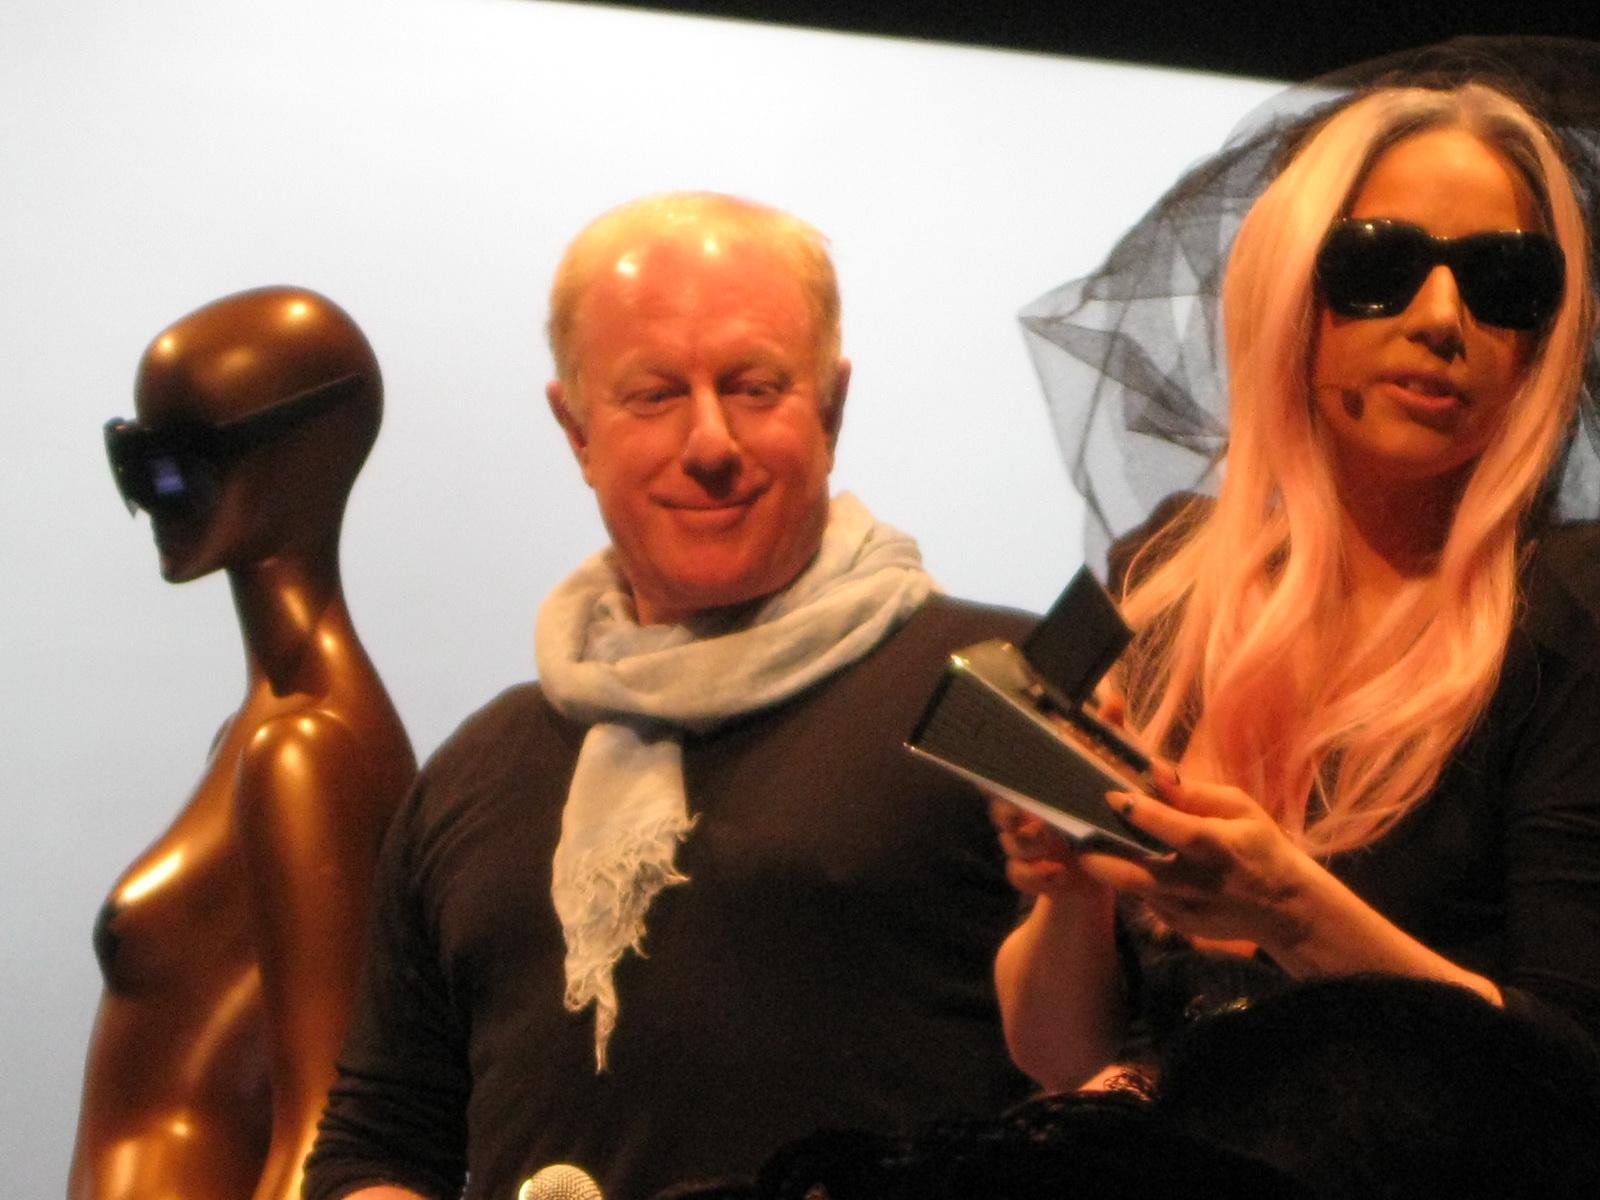 Lady Gaga at Polaroid Booth CES 2011